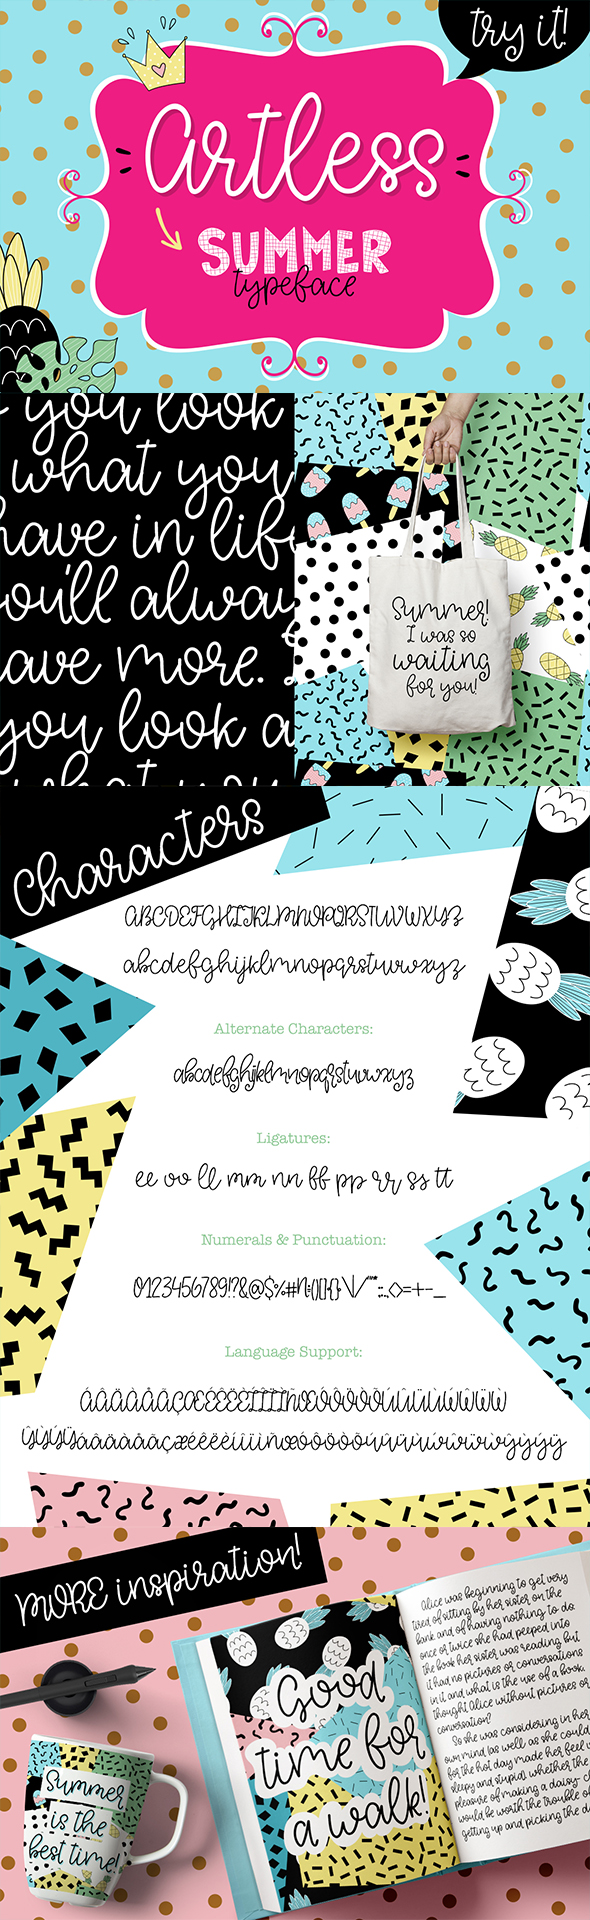 Artless Typeface - Summer Font - Calligraphy Script